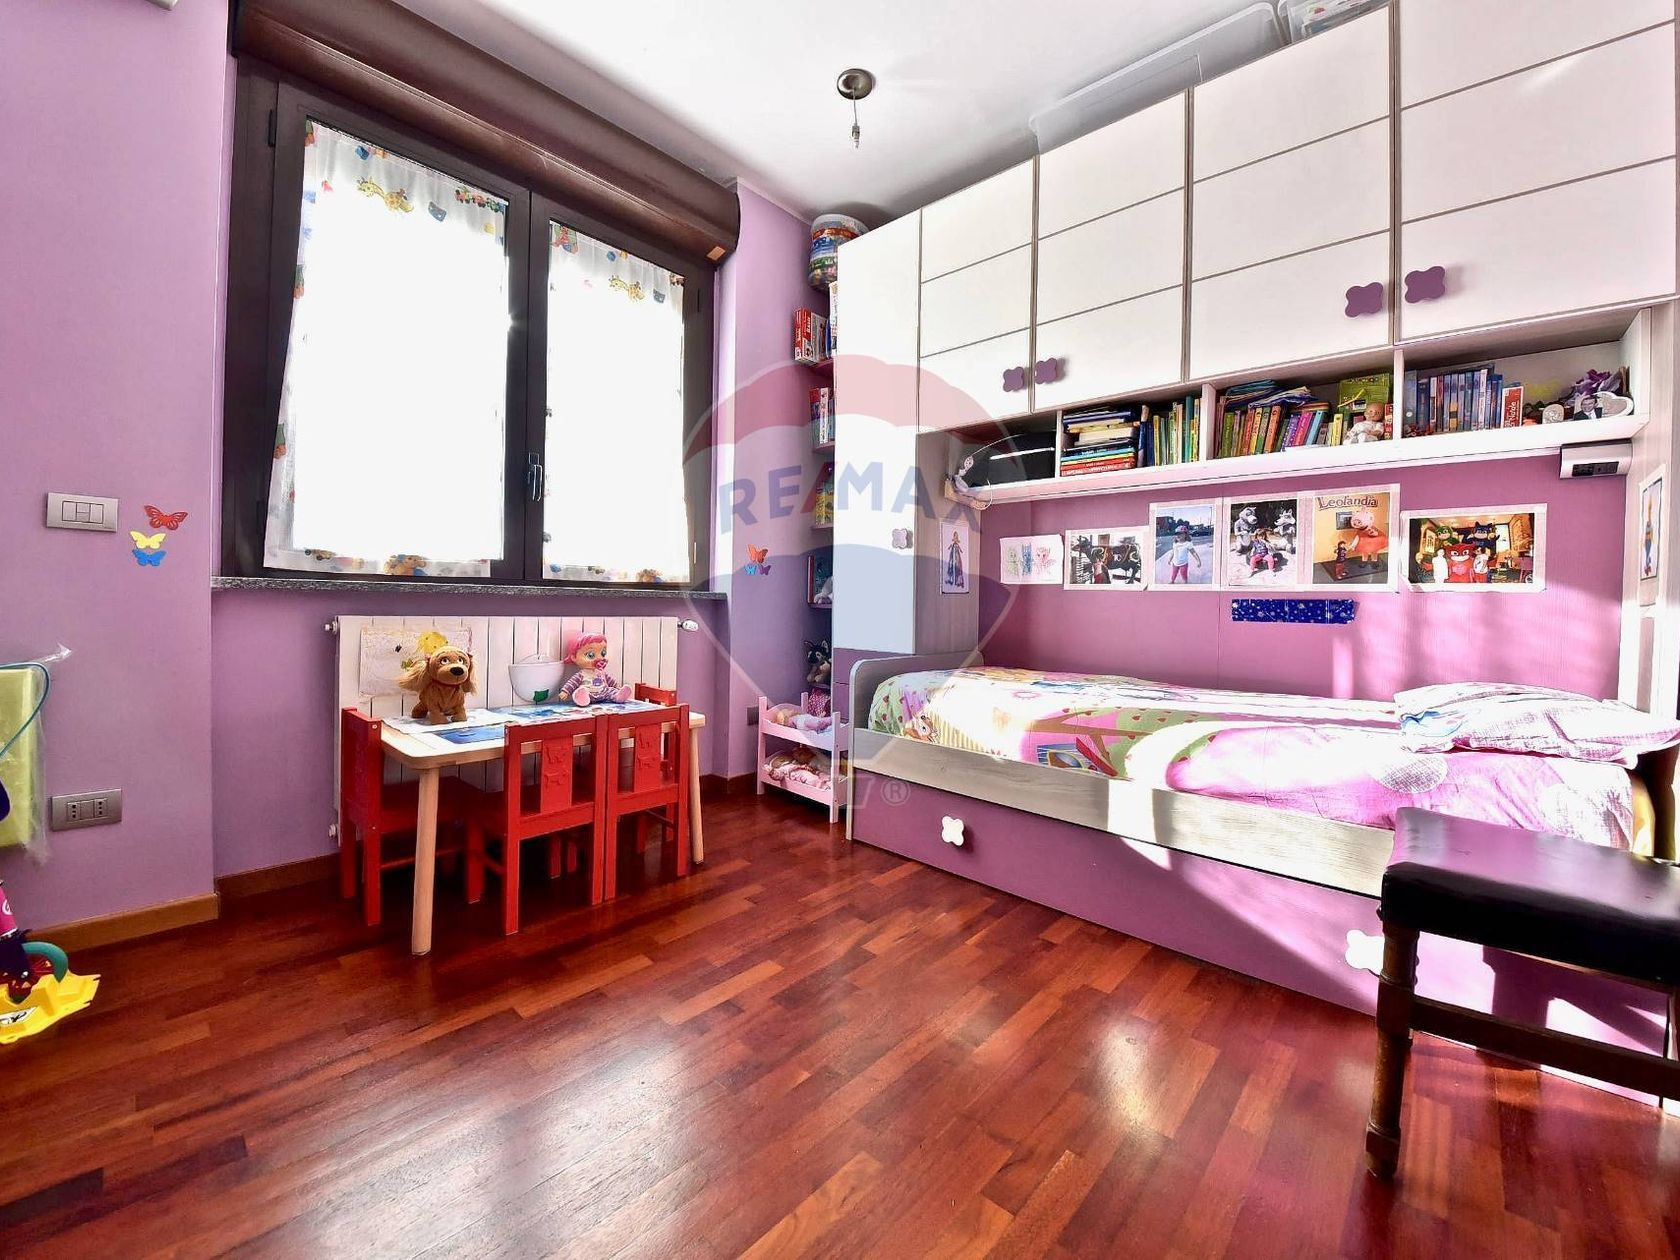 Appartamento Cascina ferrara, Saronno, VA Vendita - Foto 12